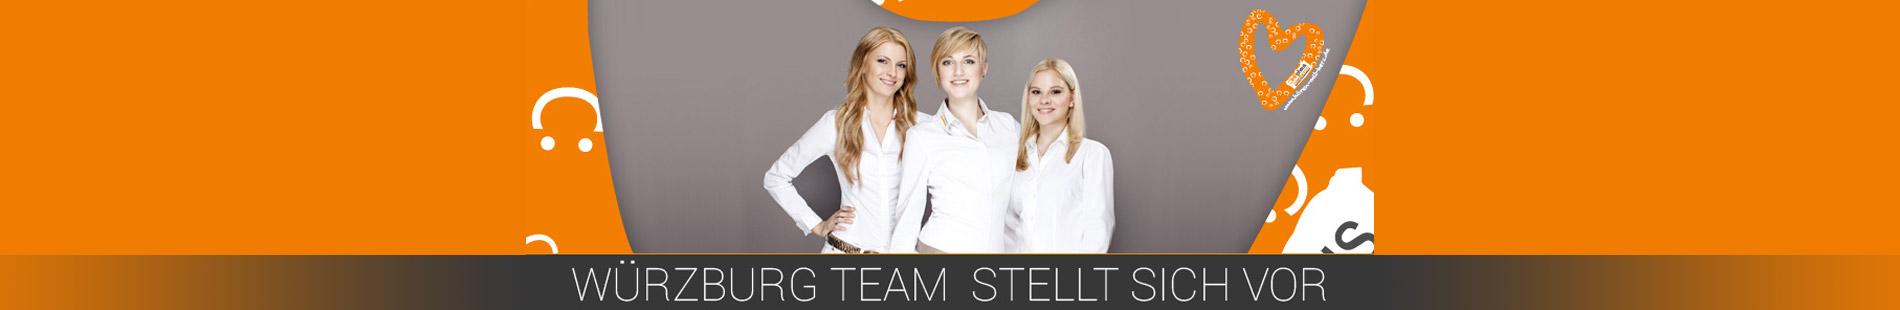 OHRpheus Hörgeräte Team Würzburg Sliderbild